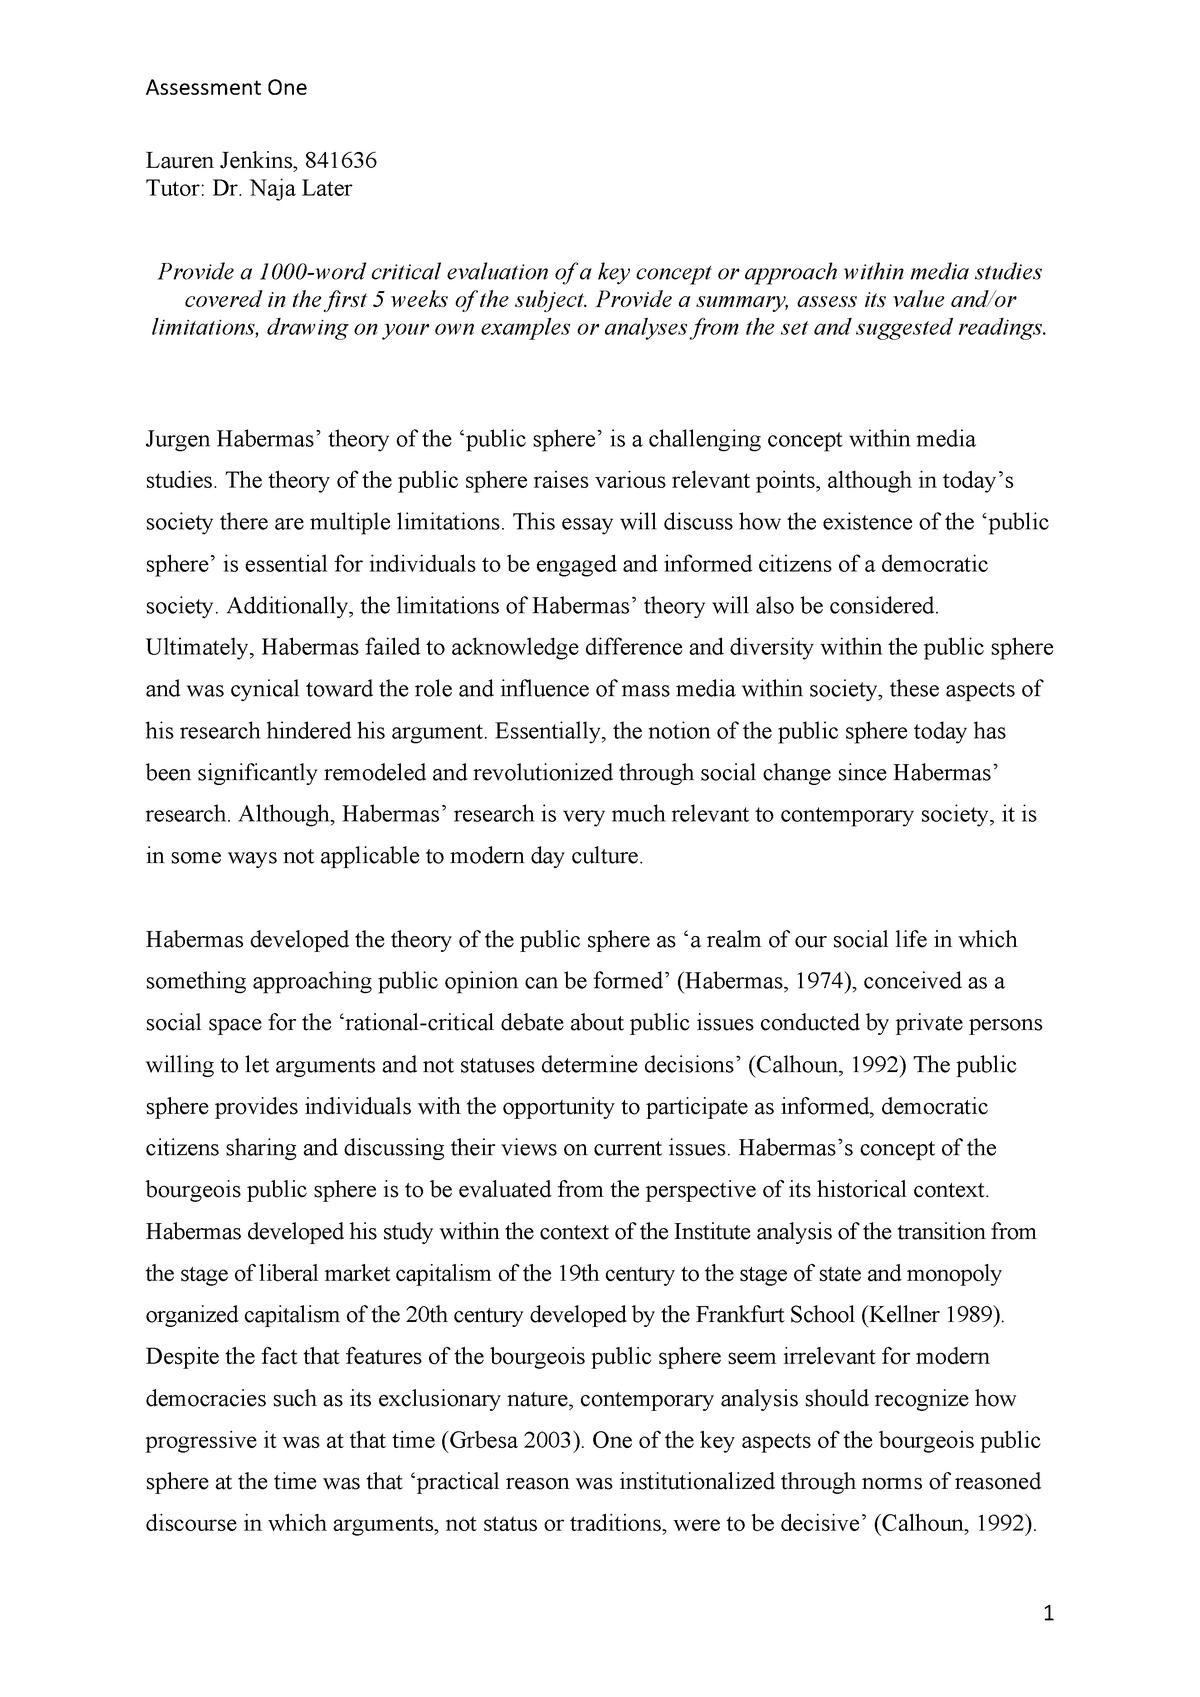 Evaluative essay on social media